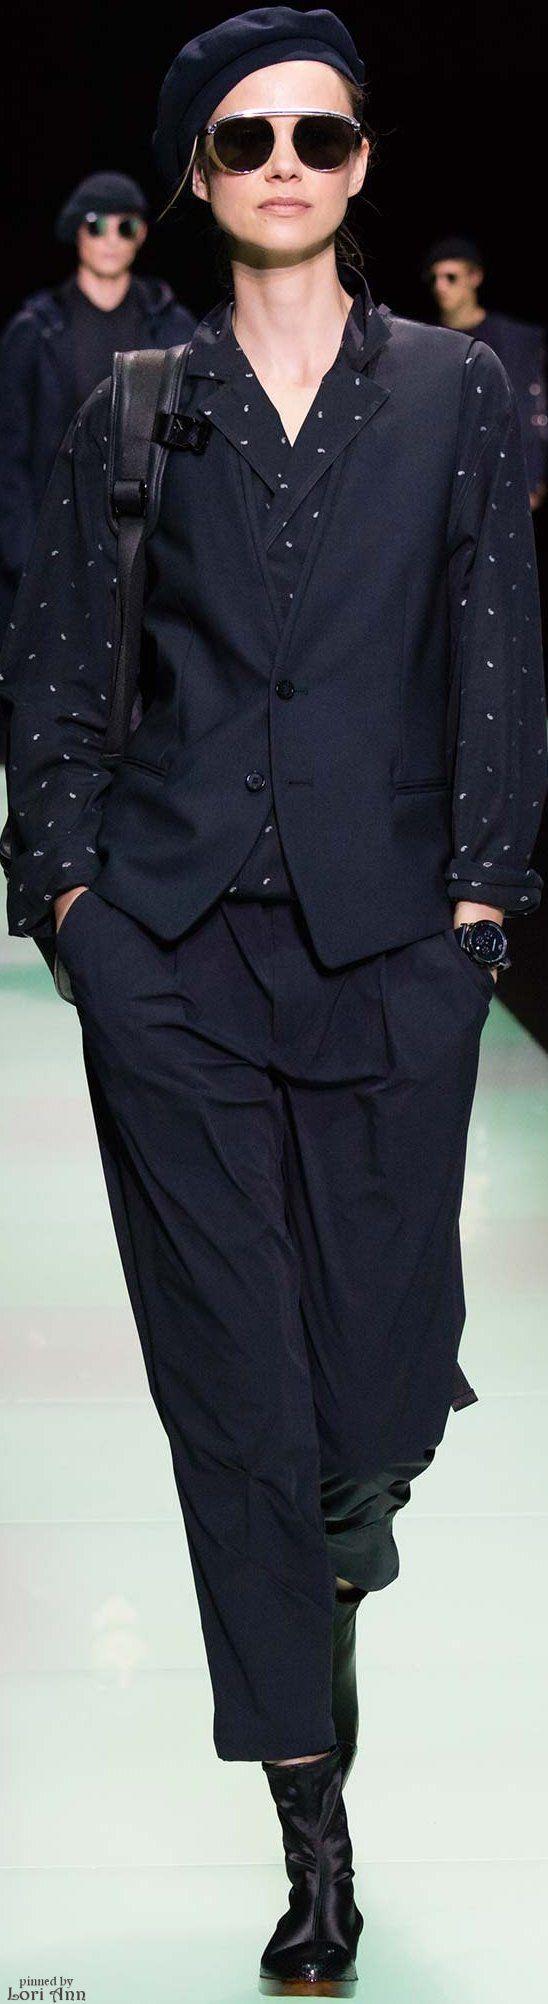 Emporio Armani from the Menswear Collection 2016